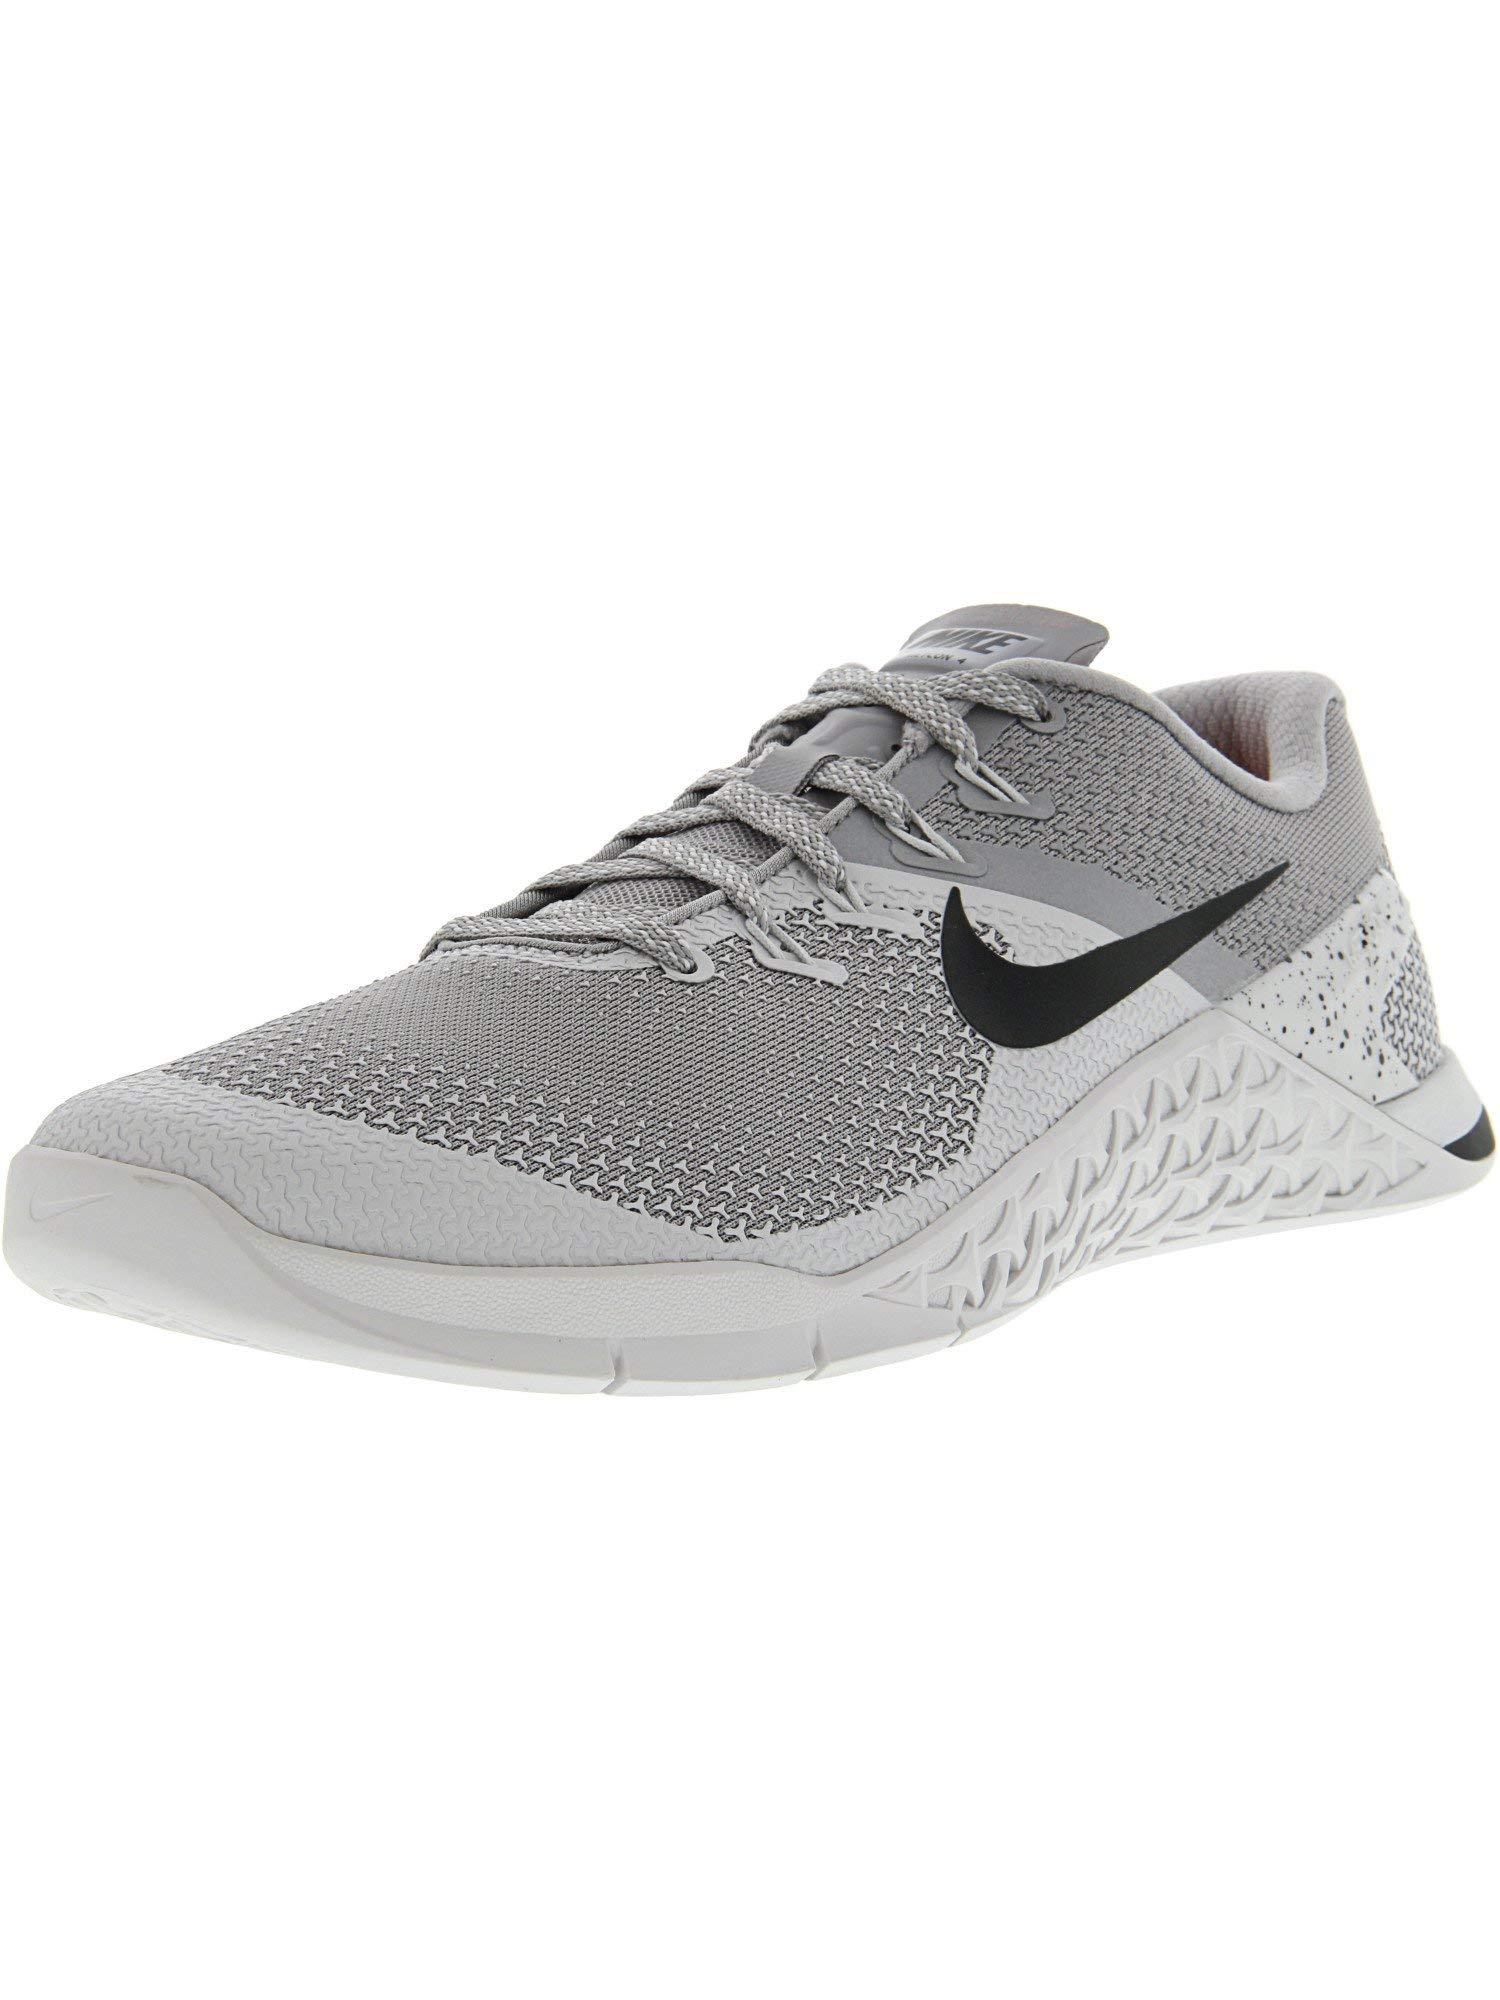 Nike Men's Metcon 4 Atmosphere Grey/Black Ankle-High Cross Trainer Shoe - 6.5M by Nike (Image #1)